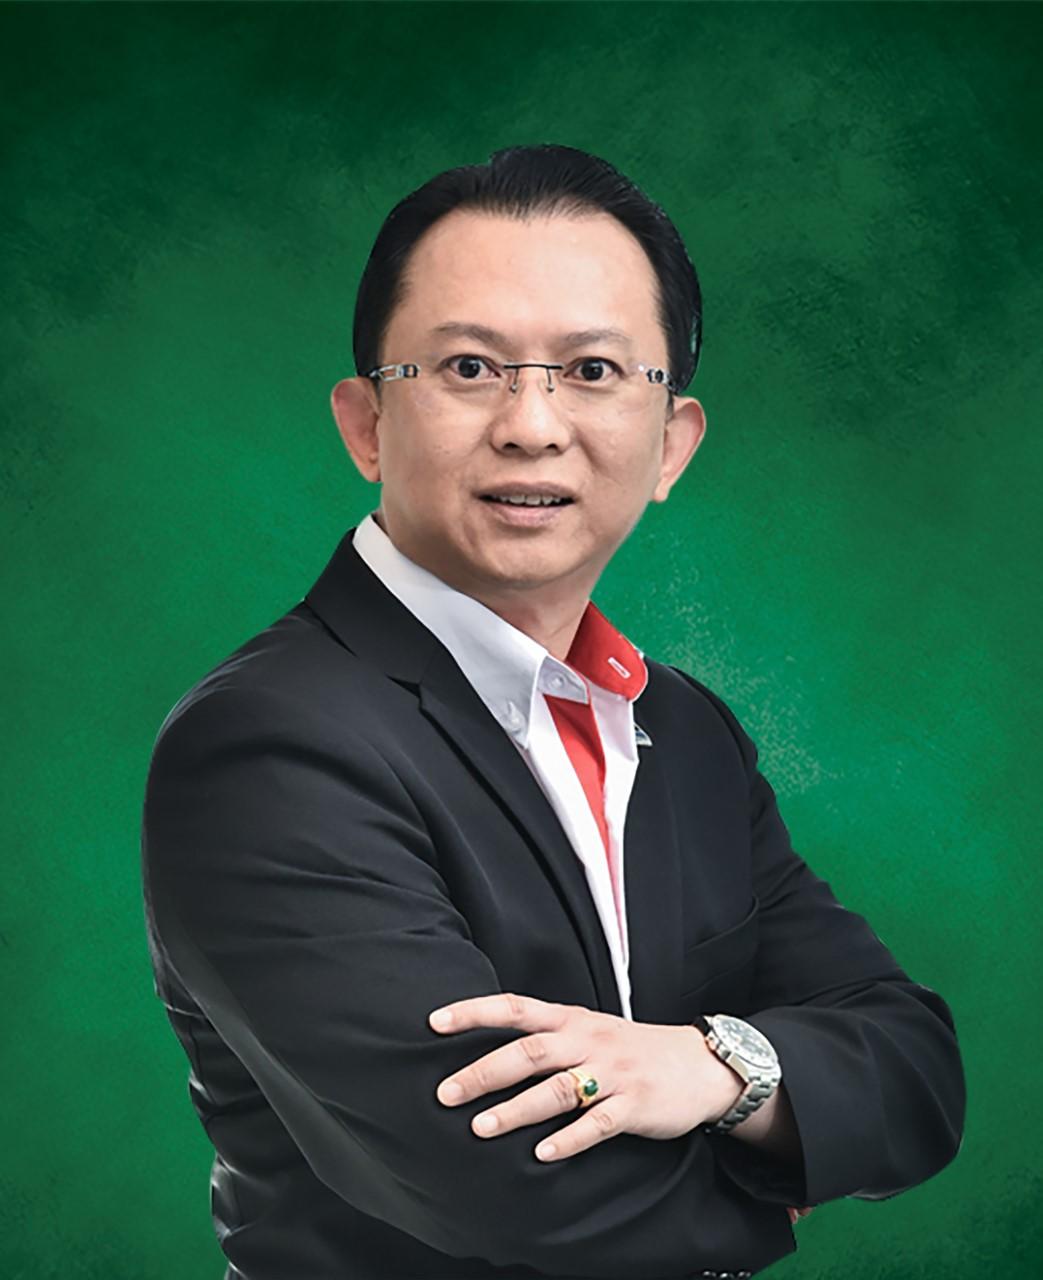 Justin Quek Ting Chin